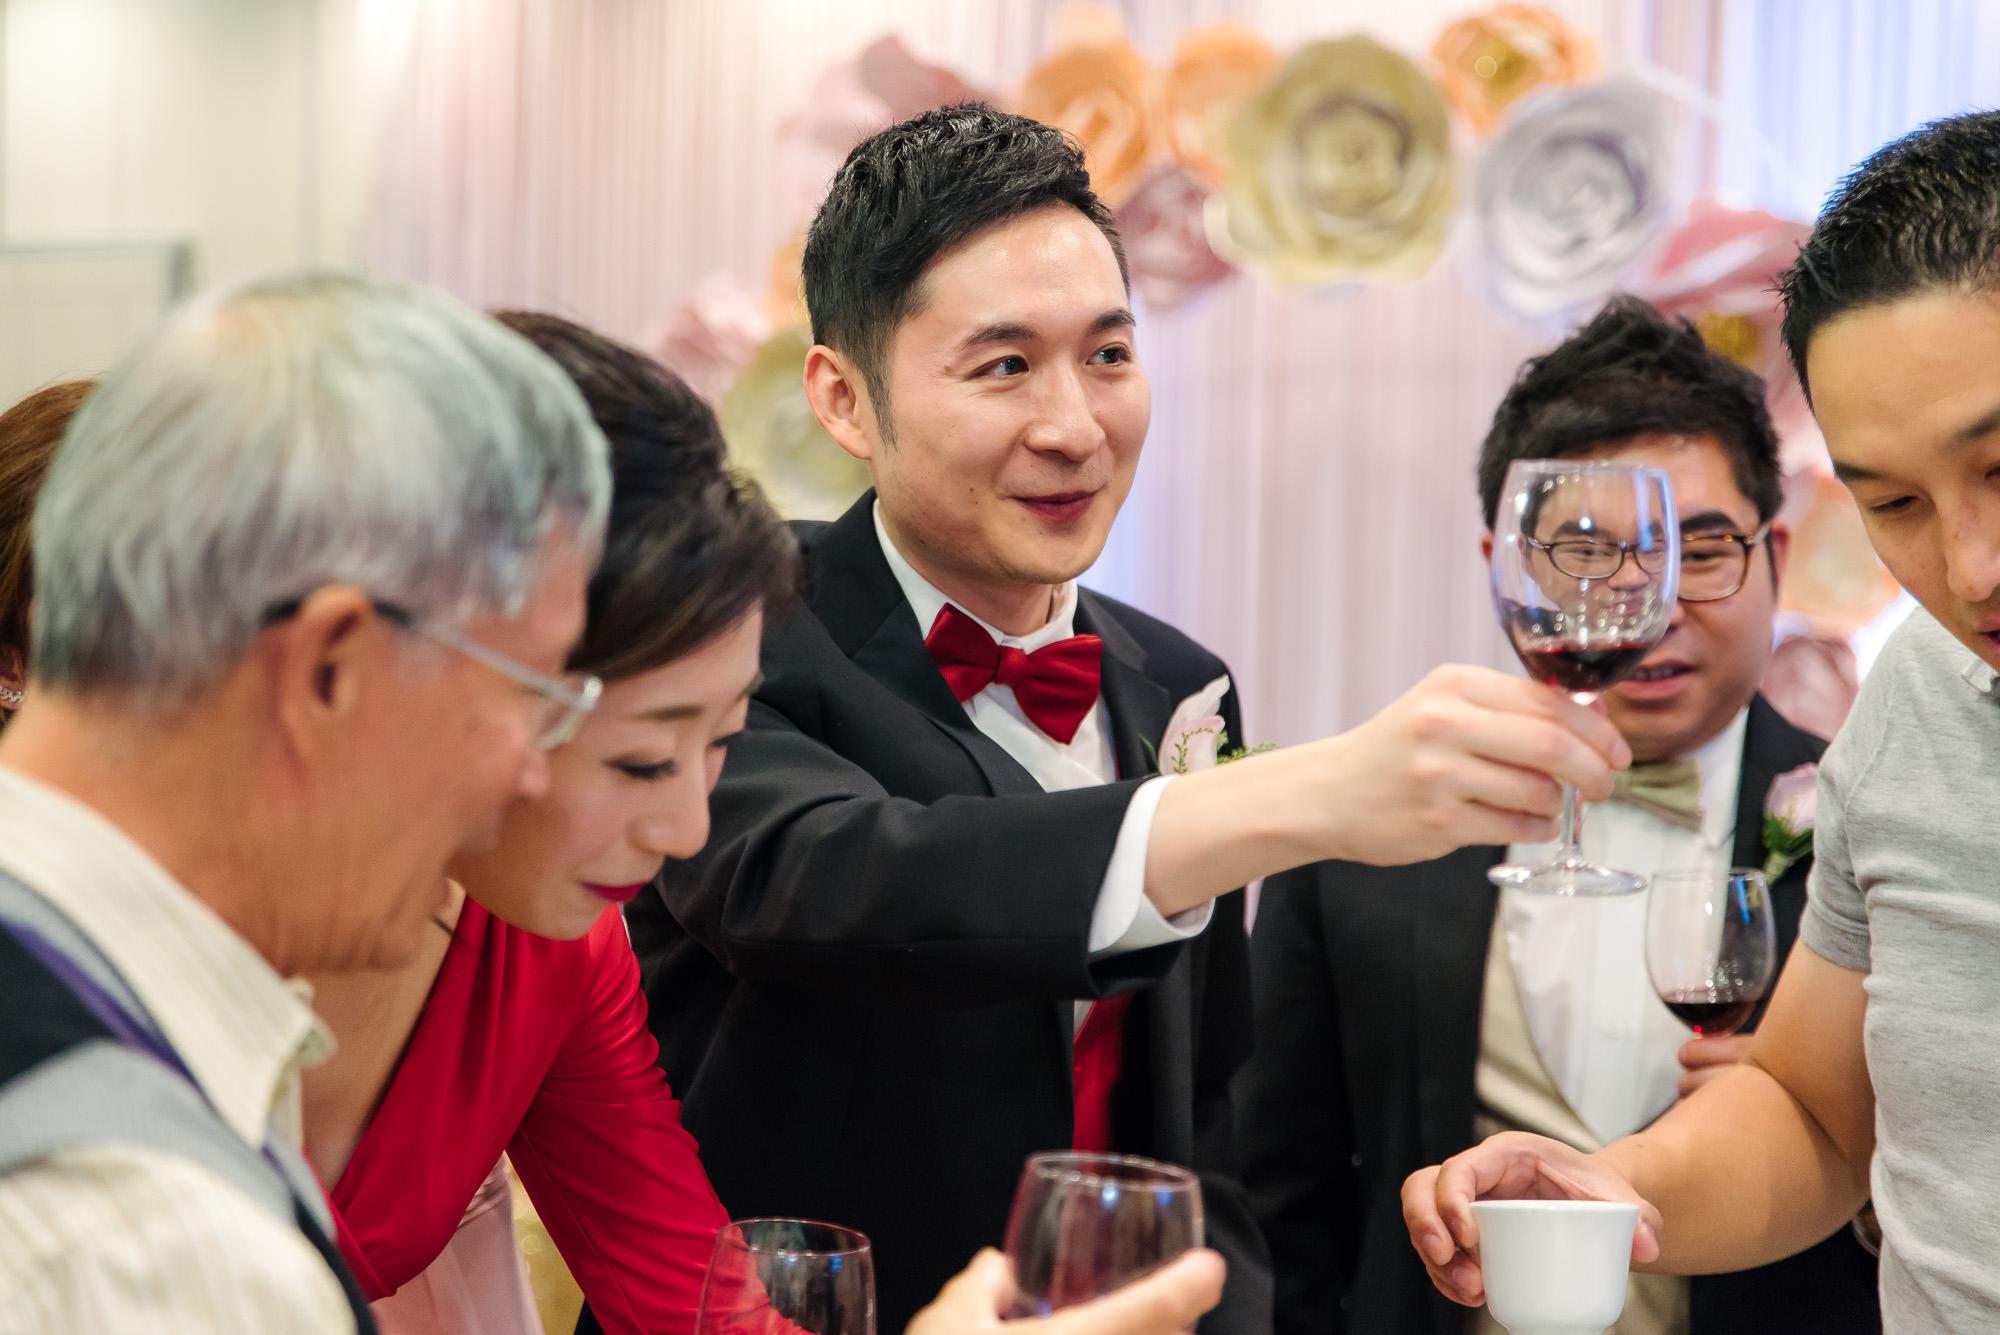 richmond_wedding_reception 2050488.jpg